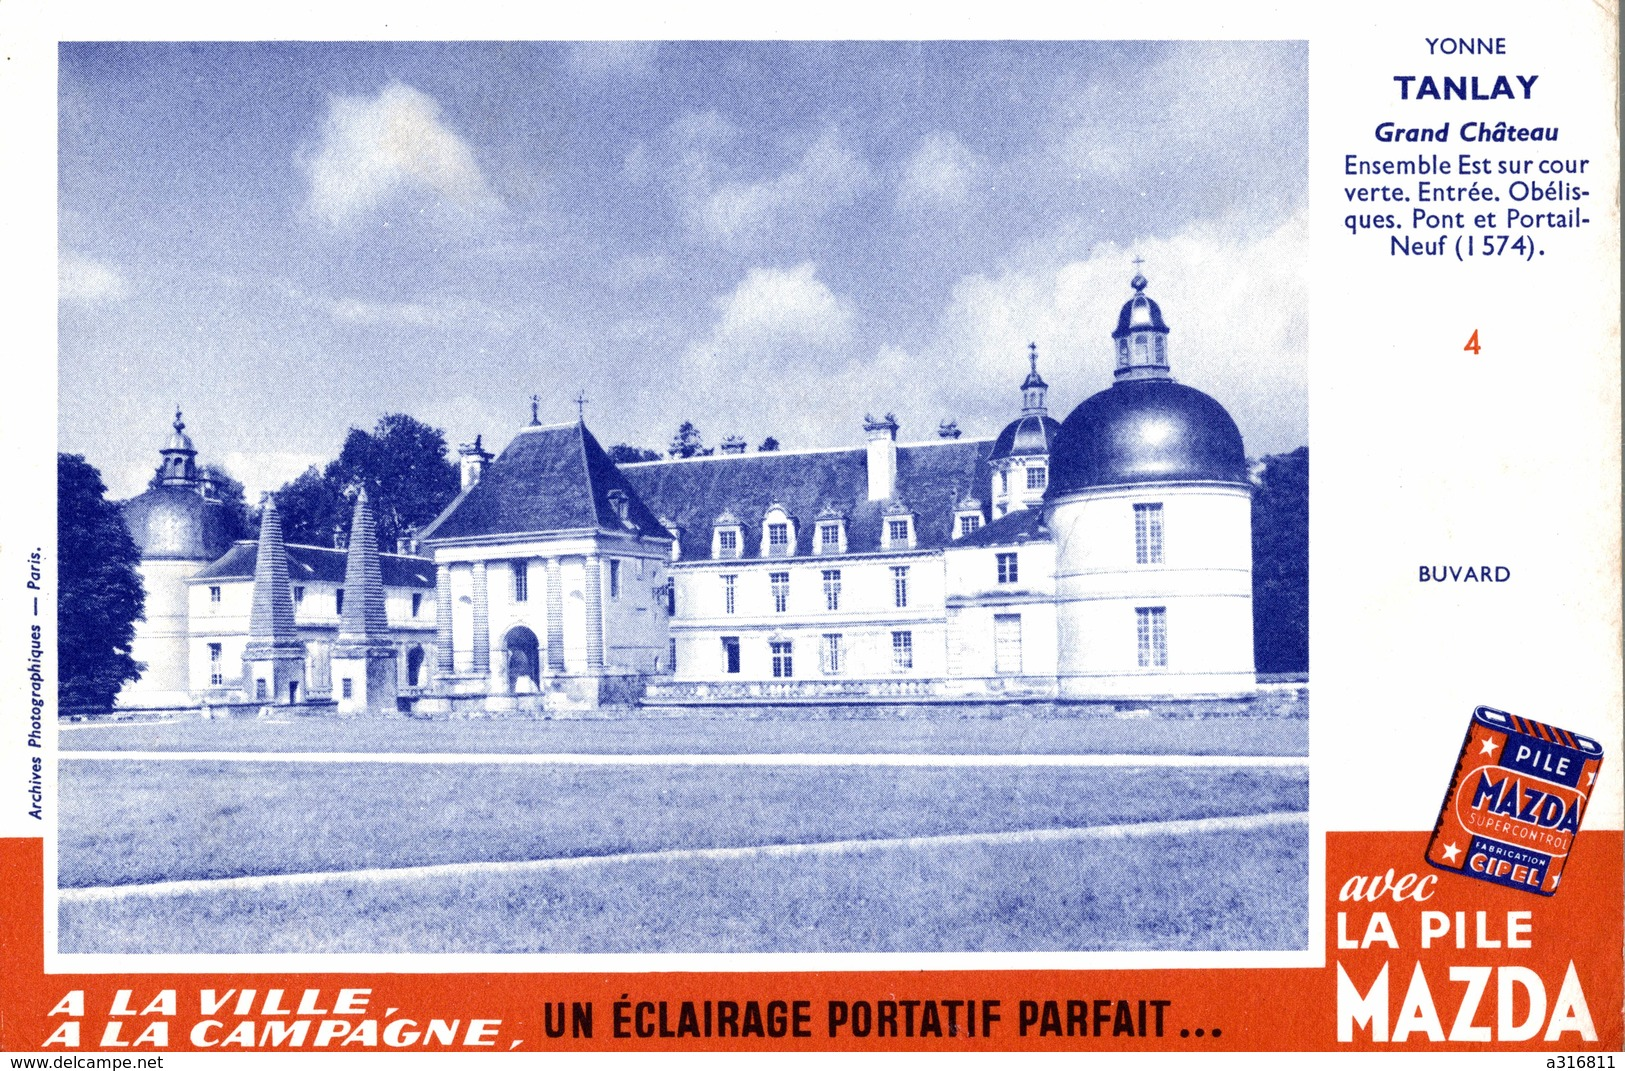 Buvard   LA PILE MAZDA  (yonne Tanlay Grand Chateau ) - Piles